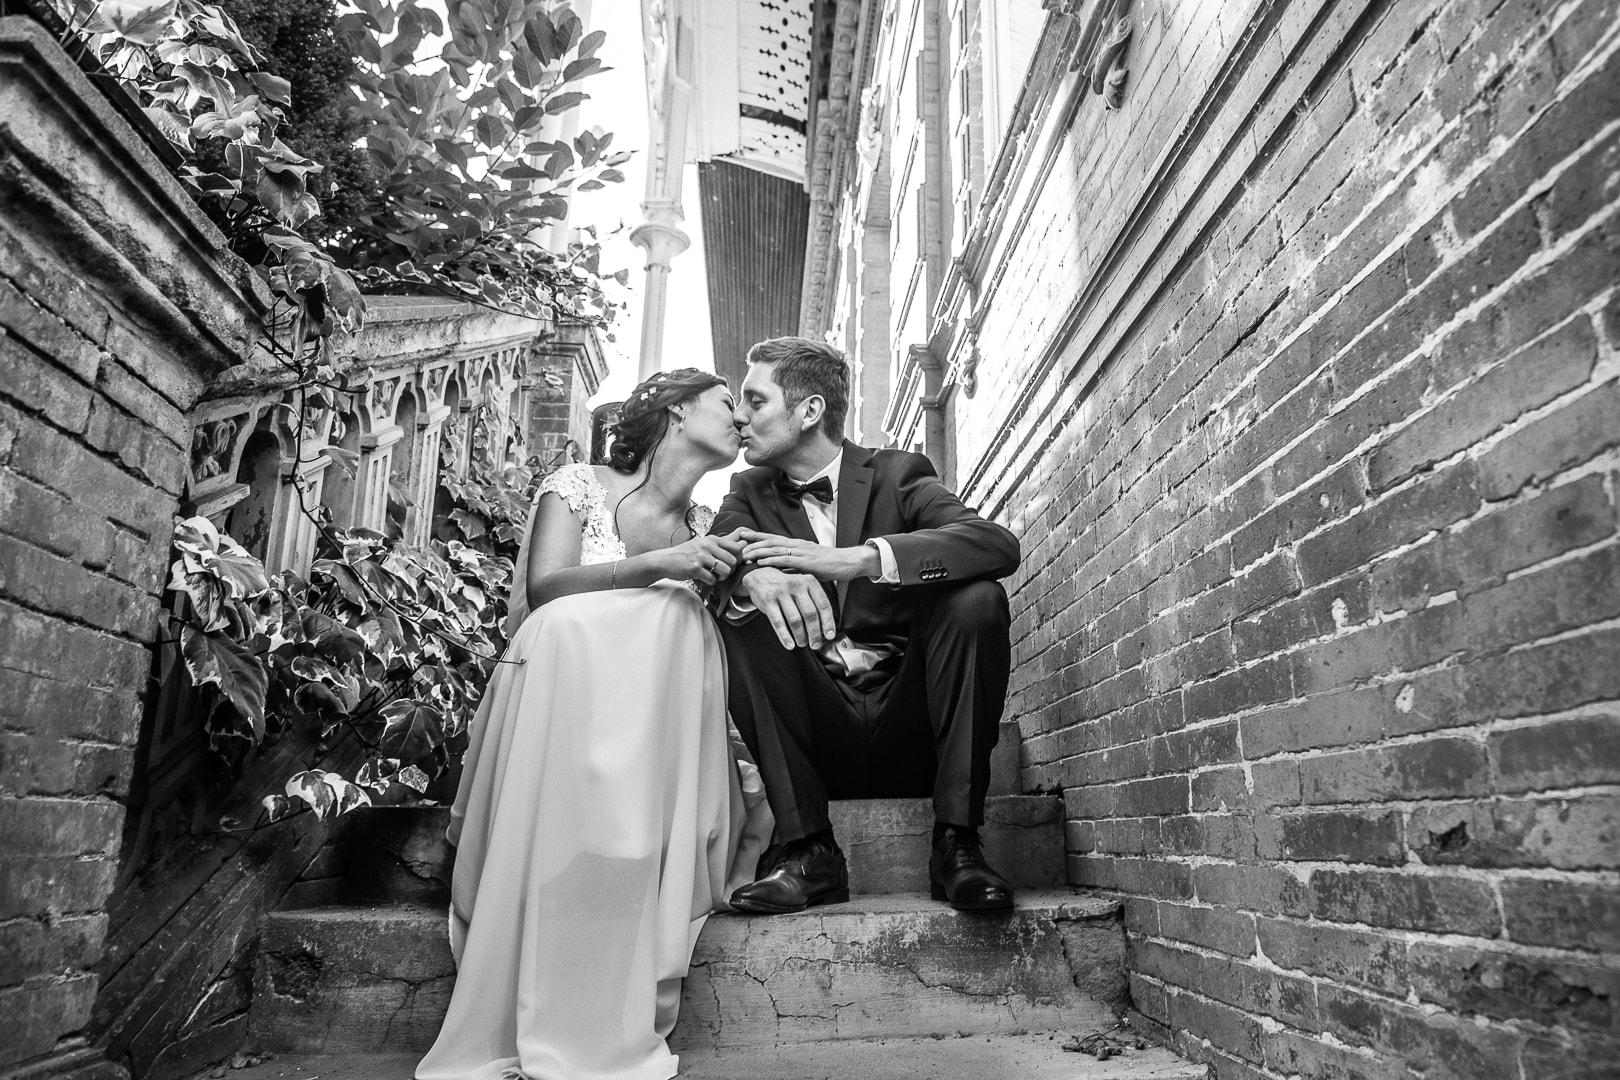 trezors-photography-photographe-professionnel-toulouse-31-mariage-reportage-photo-seance-couple (mathilde)